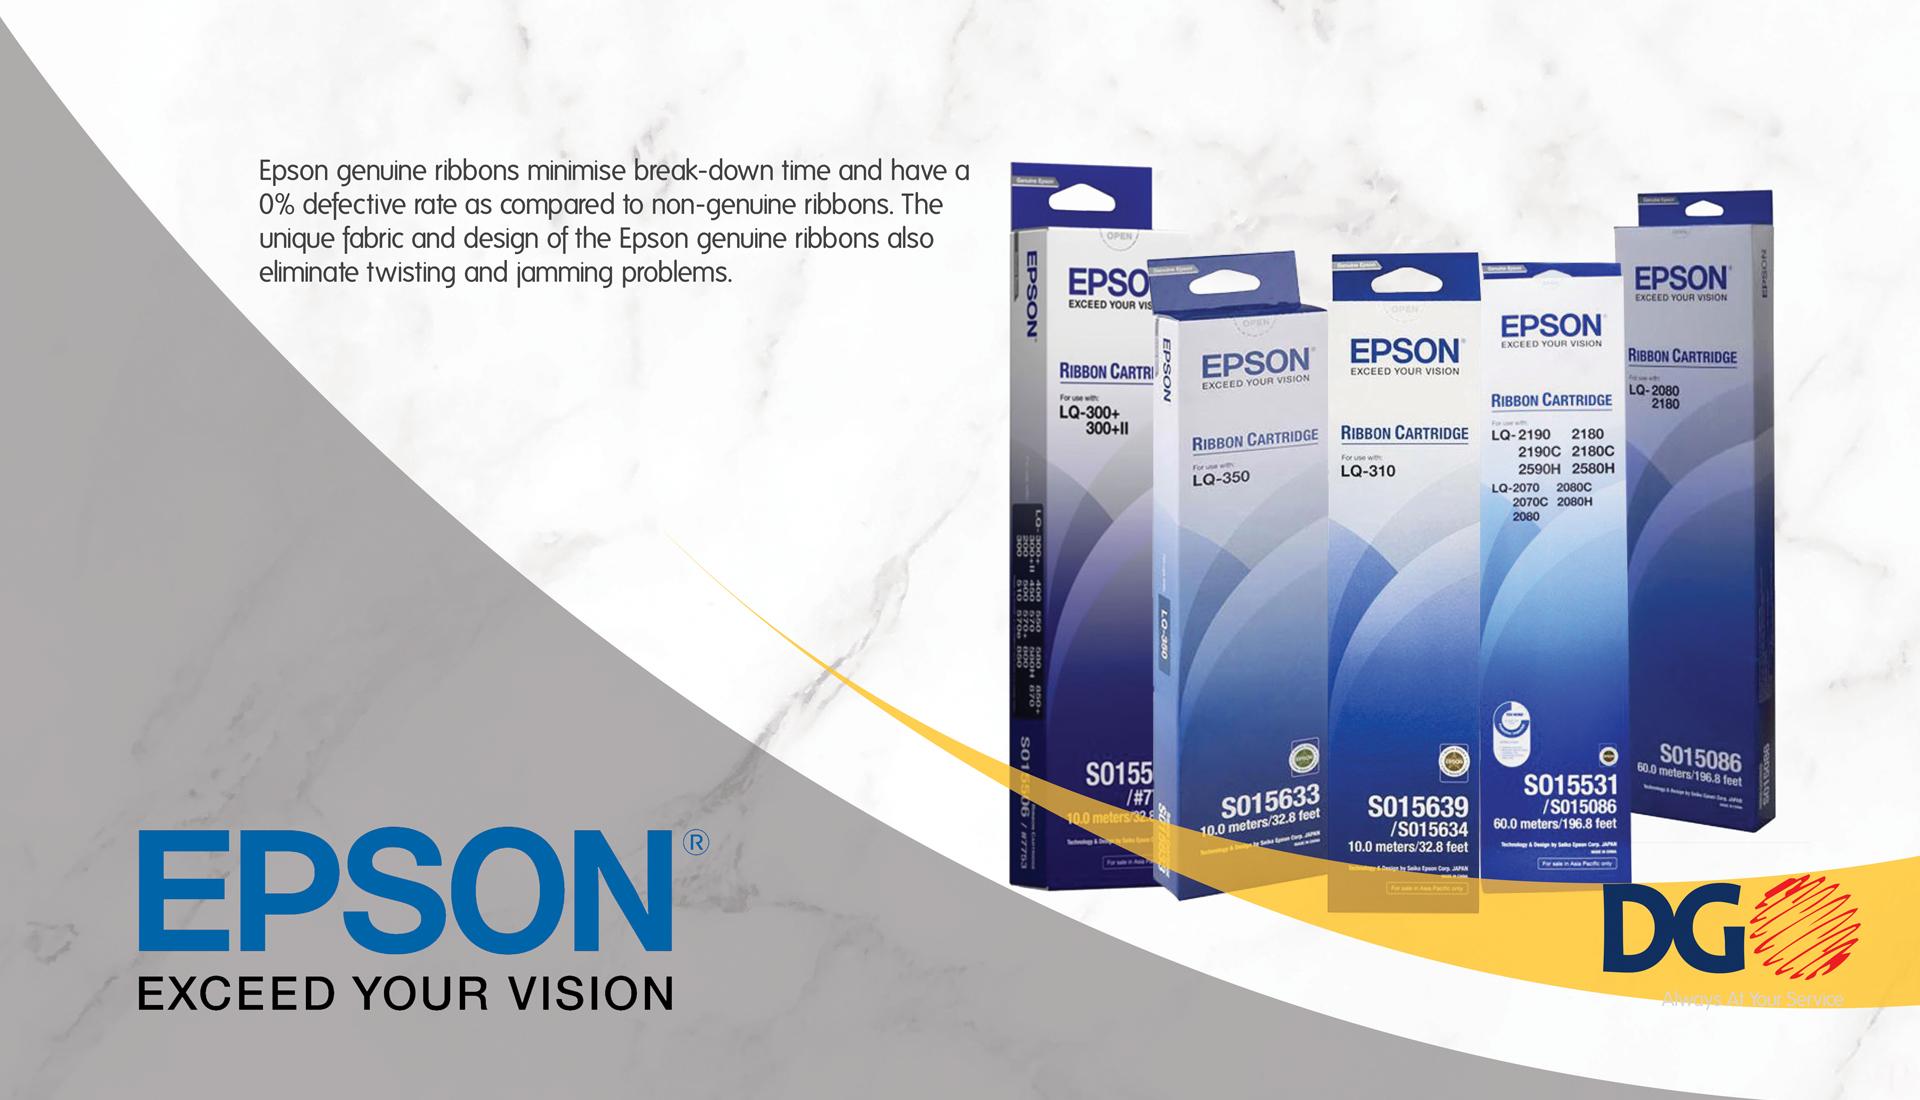 epson ribbon-banner-resize